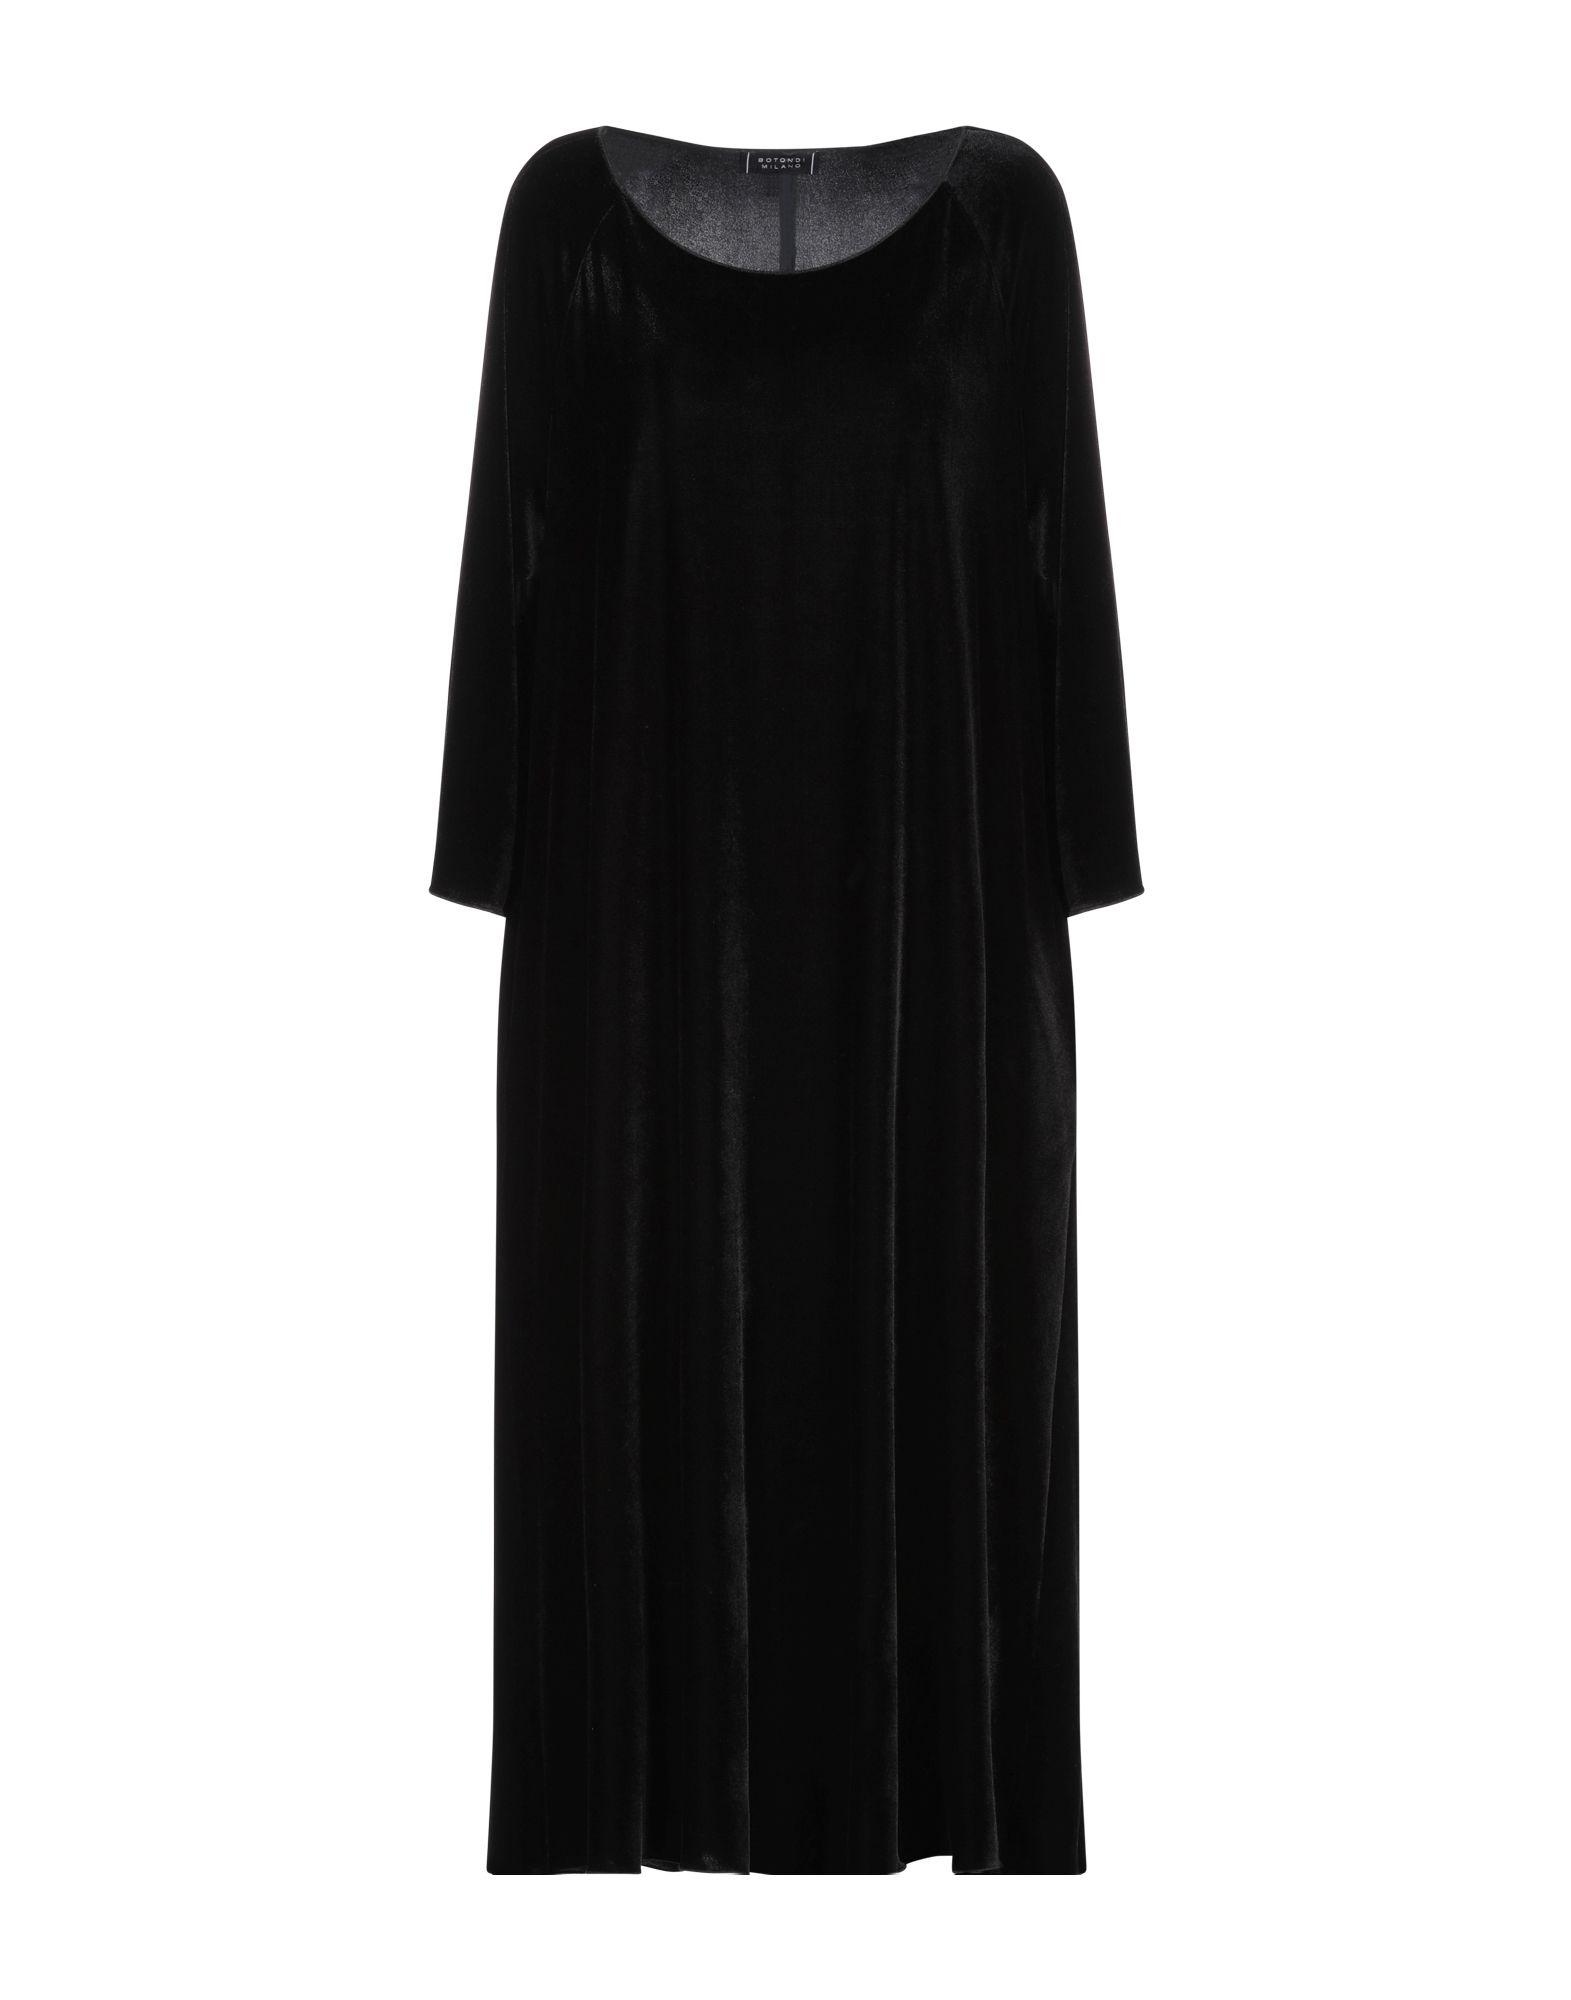 BOTONDI MILANO Платье до колена недорго, оригинальная цена